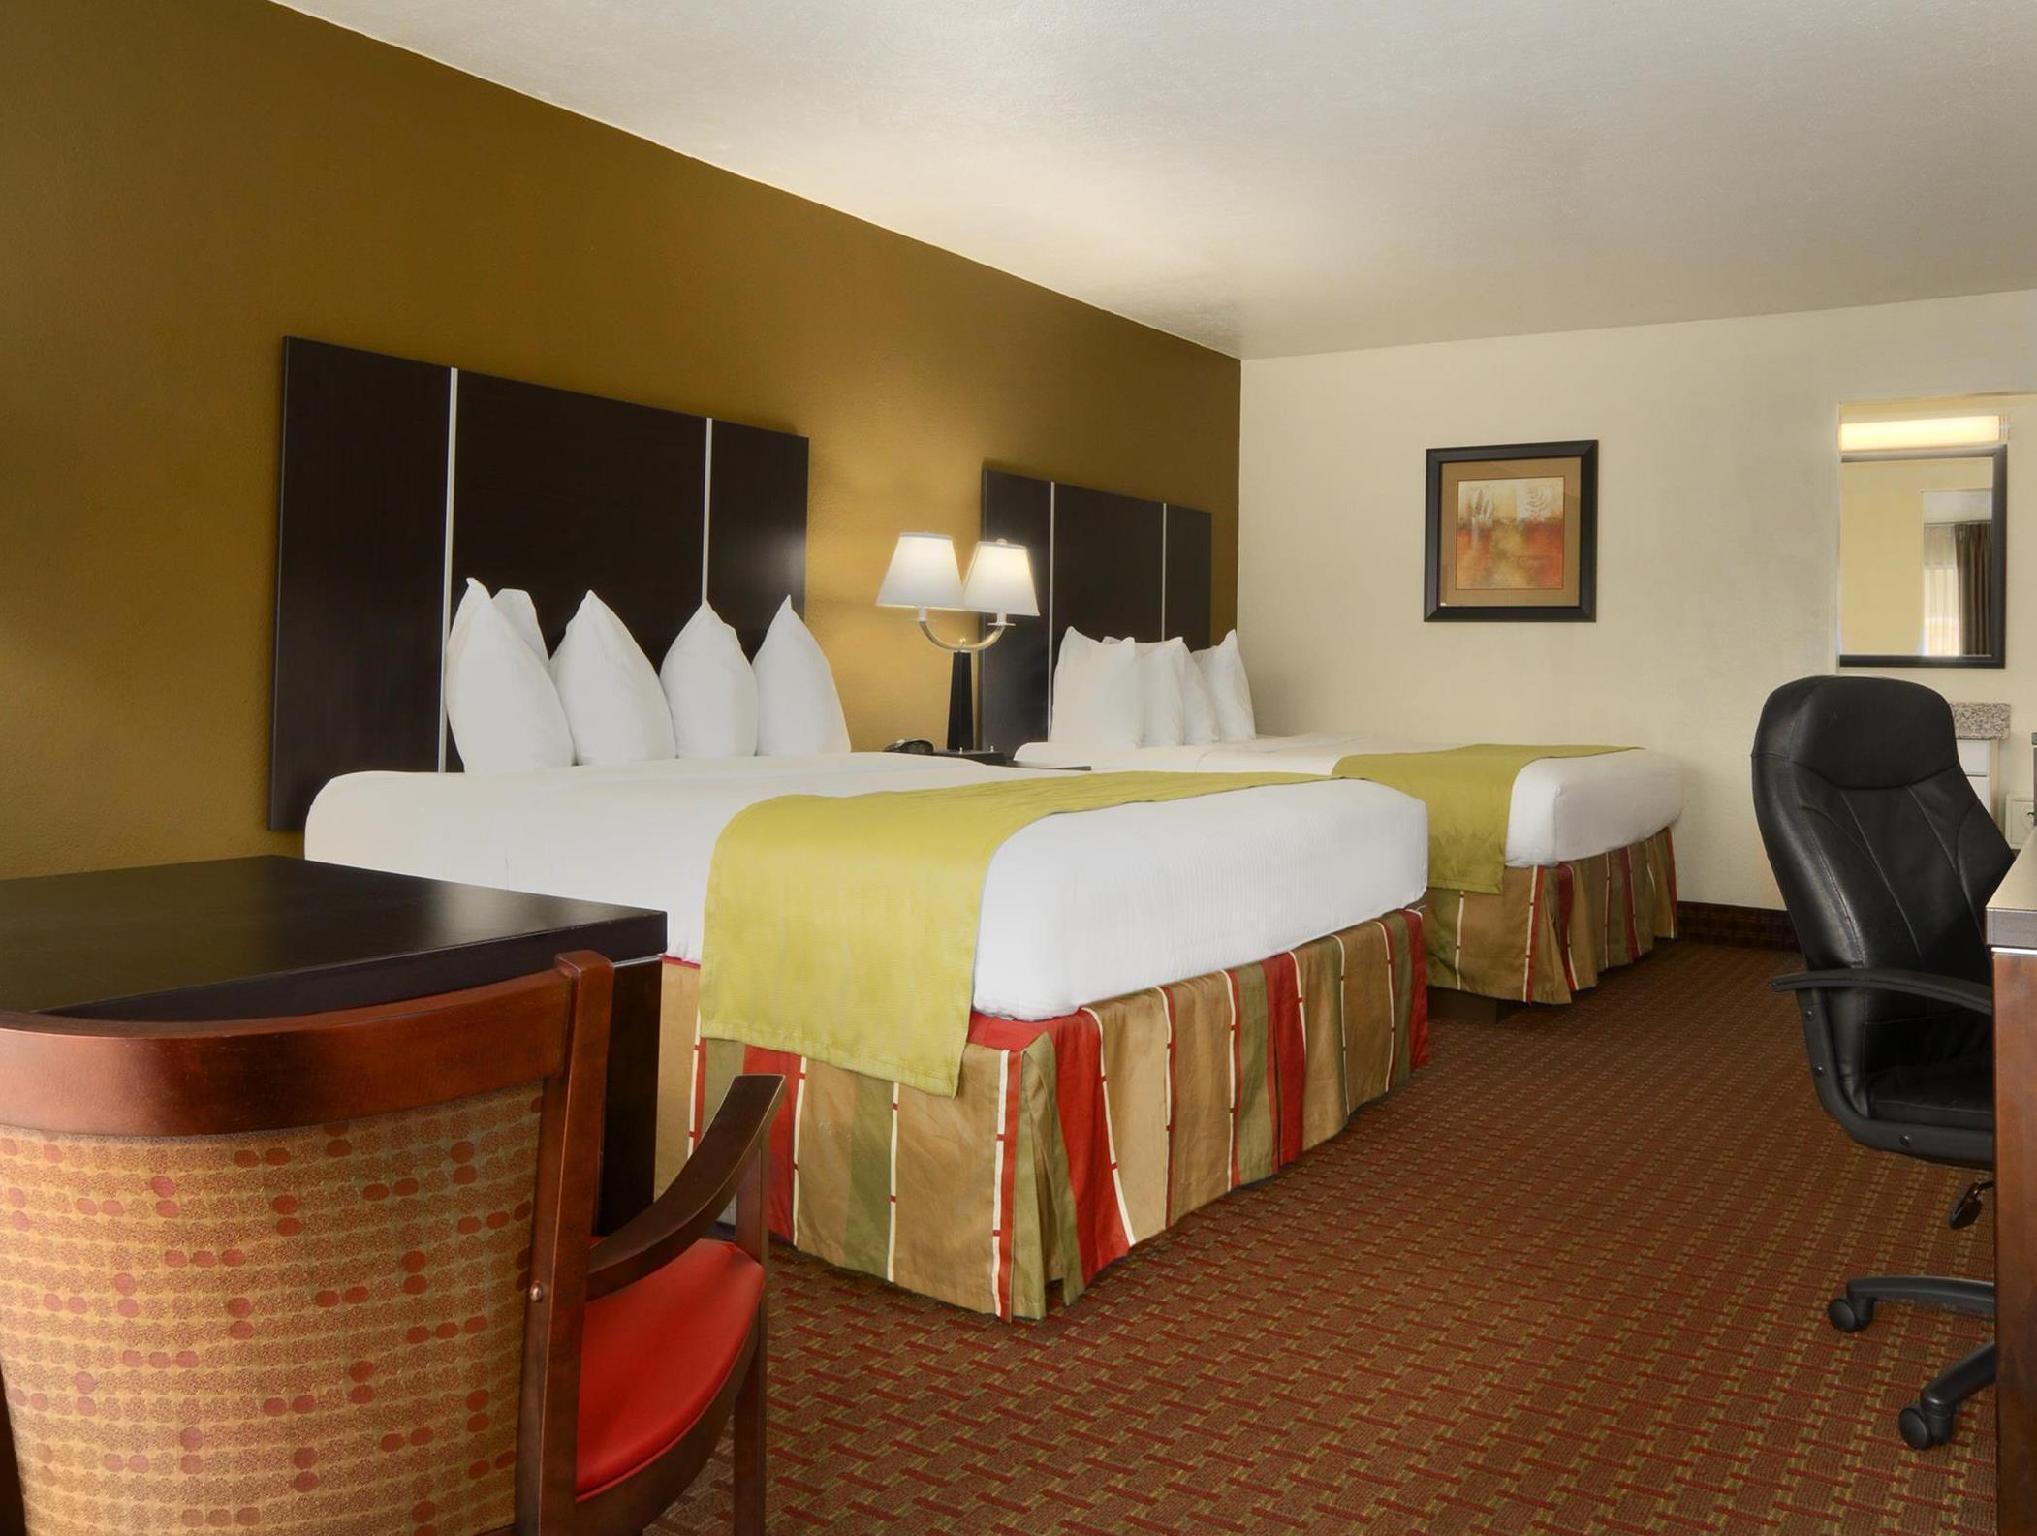 2 Queen Beds Best Western of Asheville Biltmore East